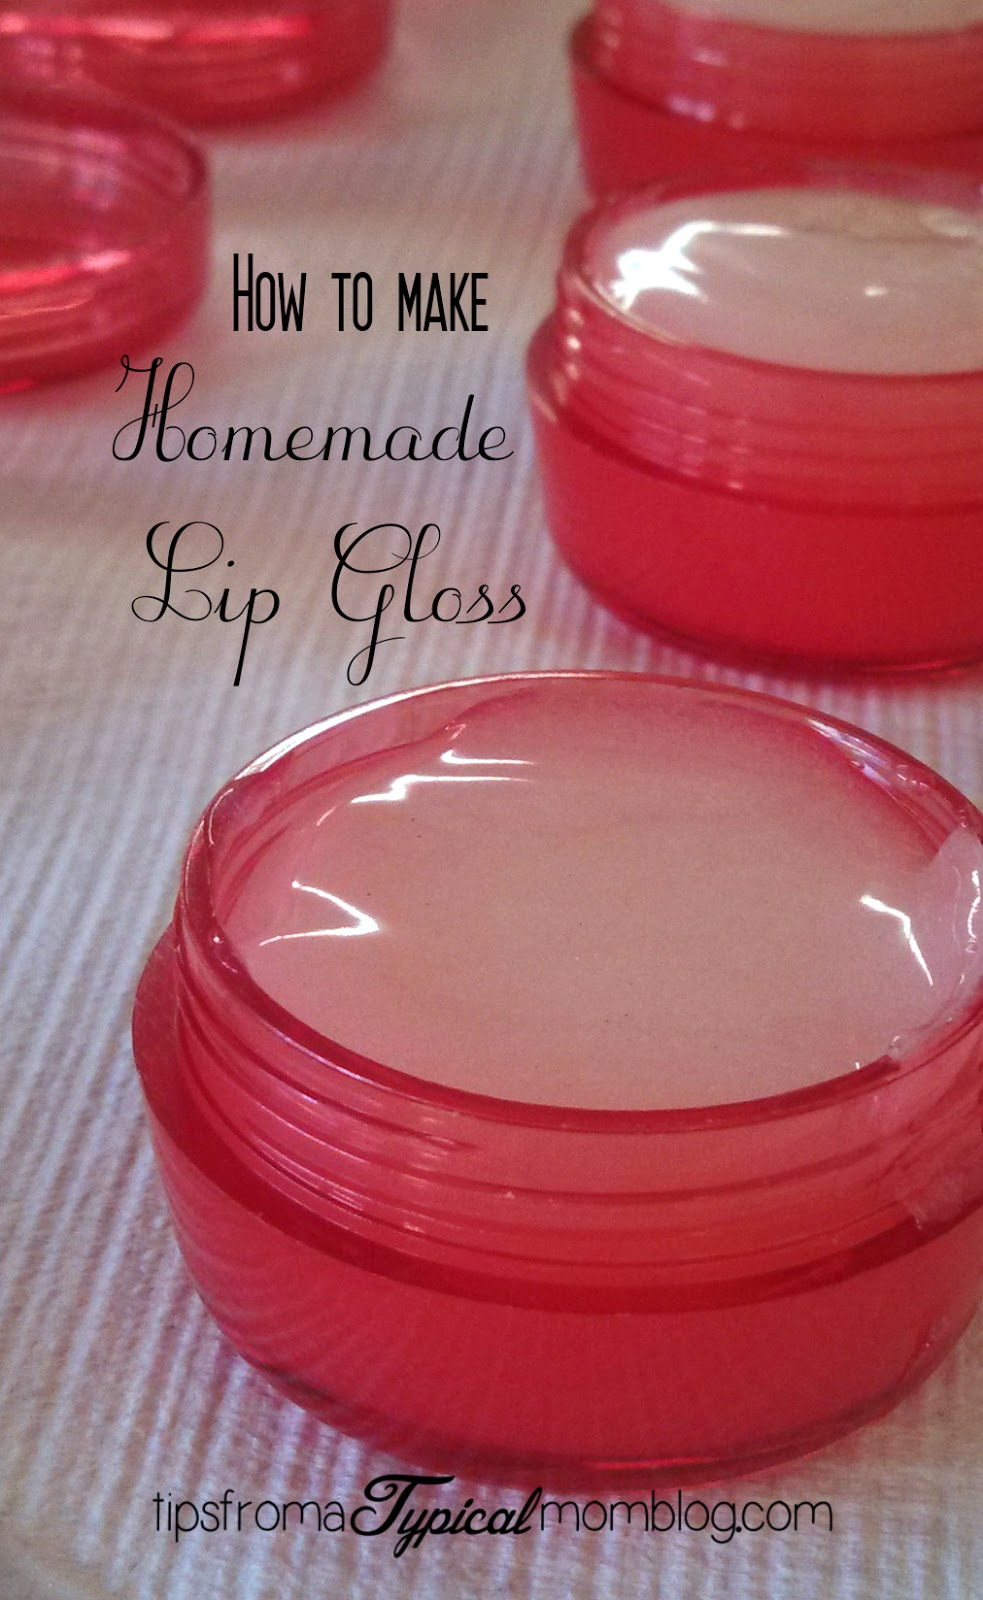 How to make lip gloss 87